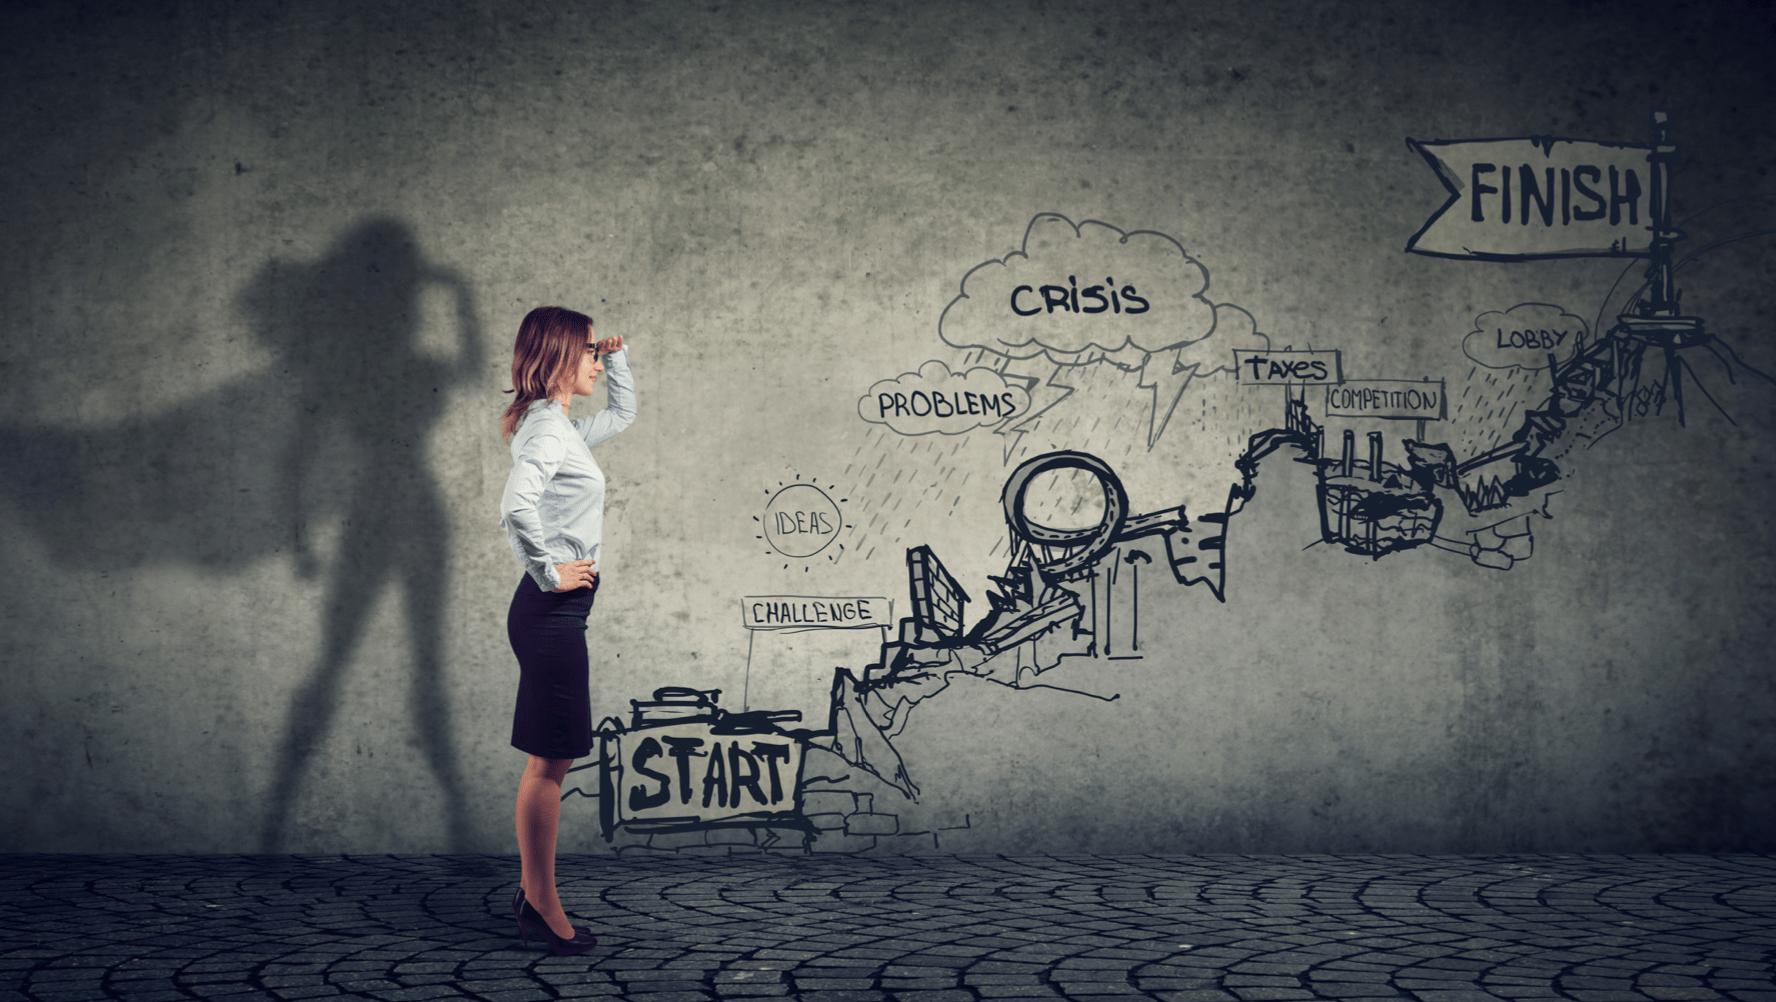 quarter life crisis | mid career crisis | midlife crisis – geht's denn auch ohne Krisen?